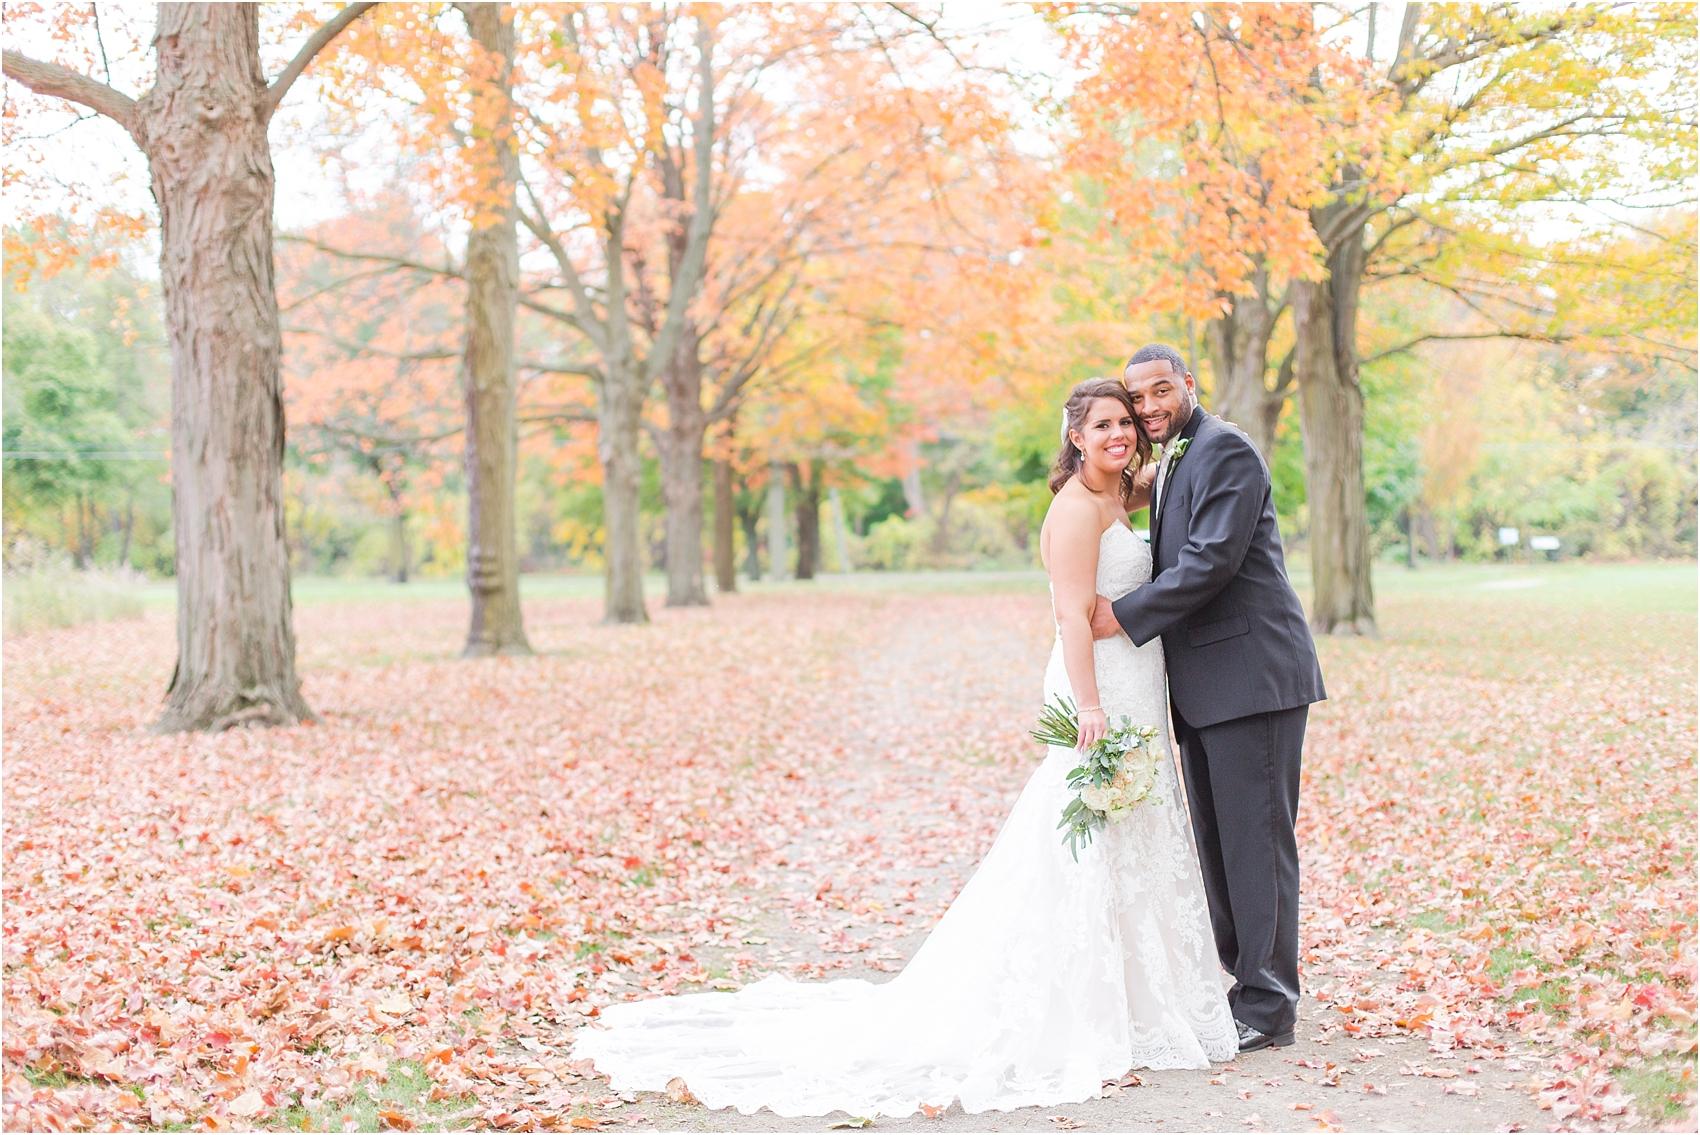 elegant-and-romantic-fall-wedding-photos-at-st-marys-catholic-church-in-monroe-michigan-by-courtney-carolyn-photography_0039.jpg